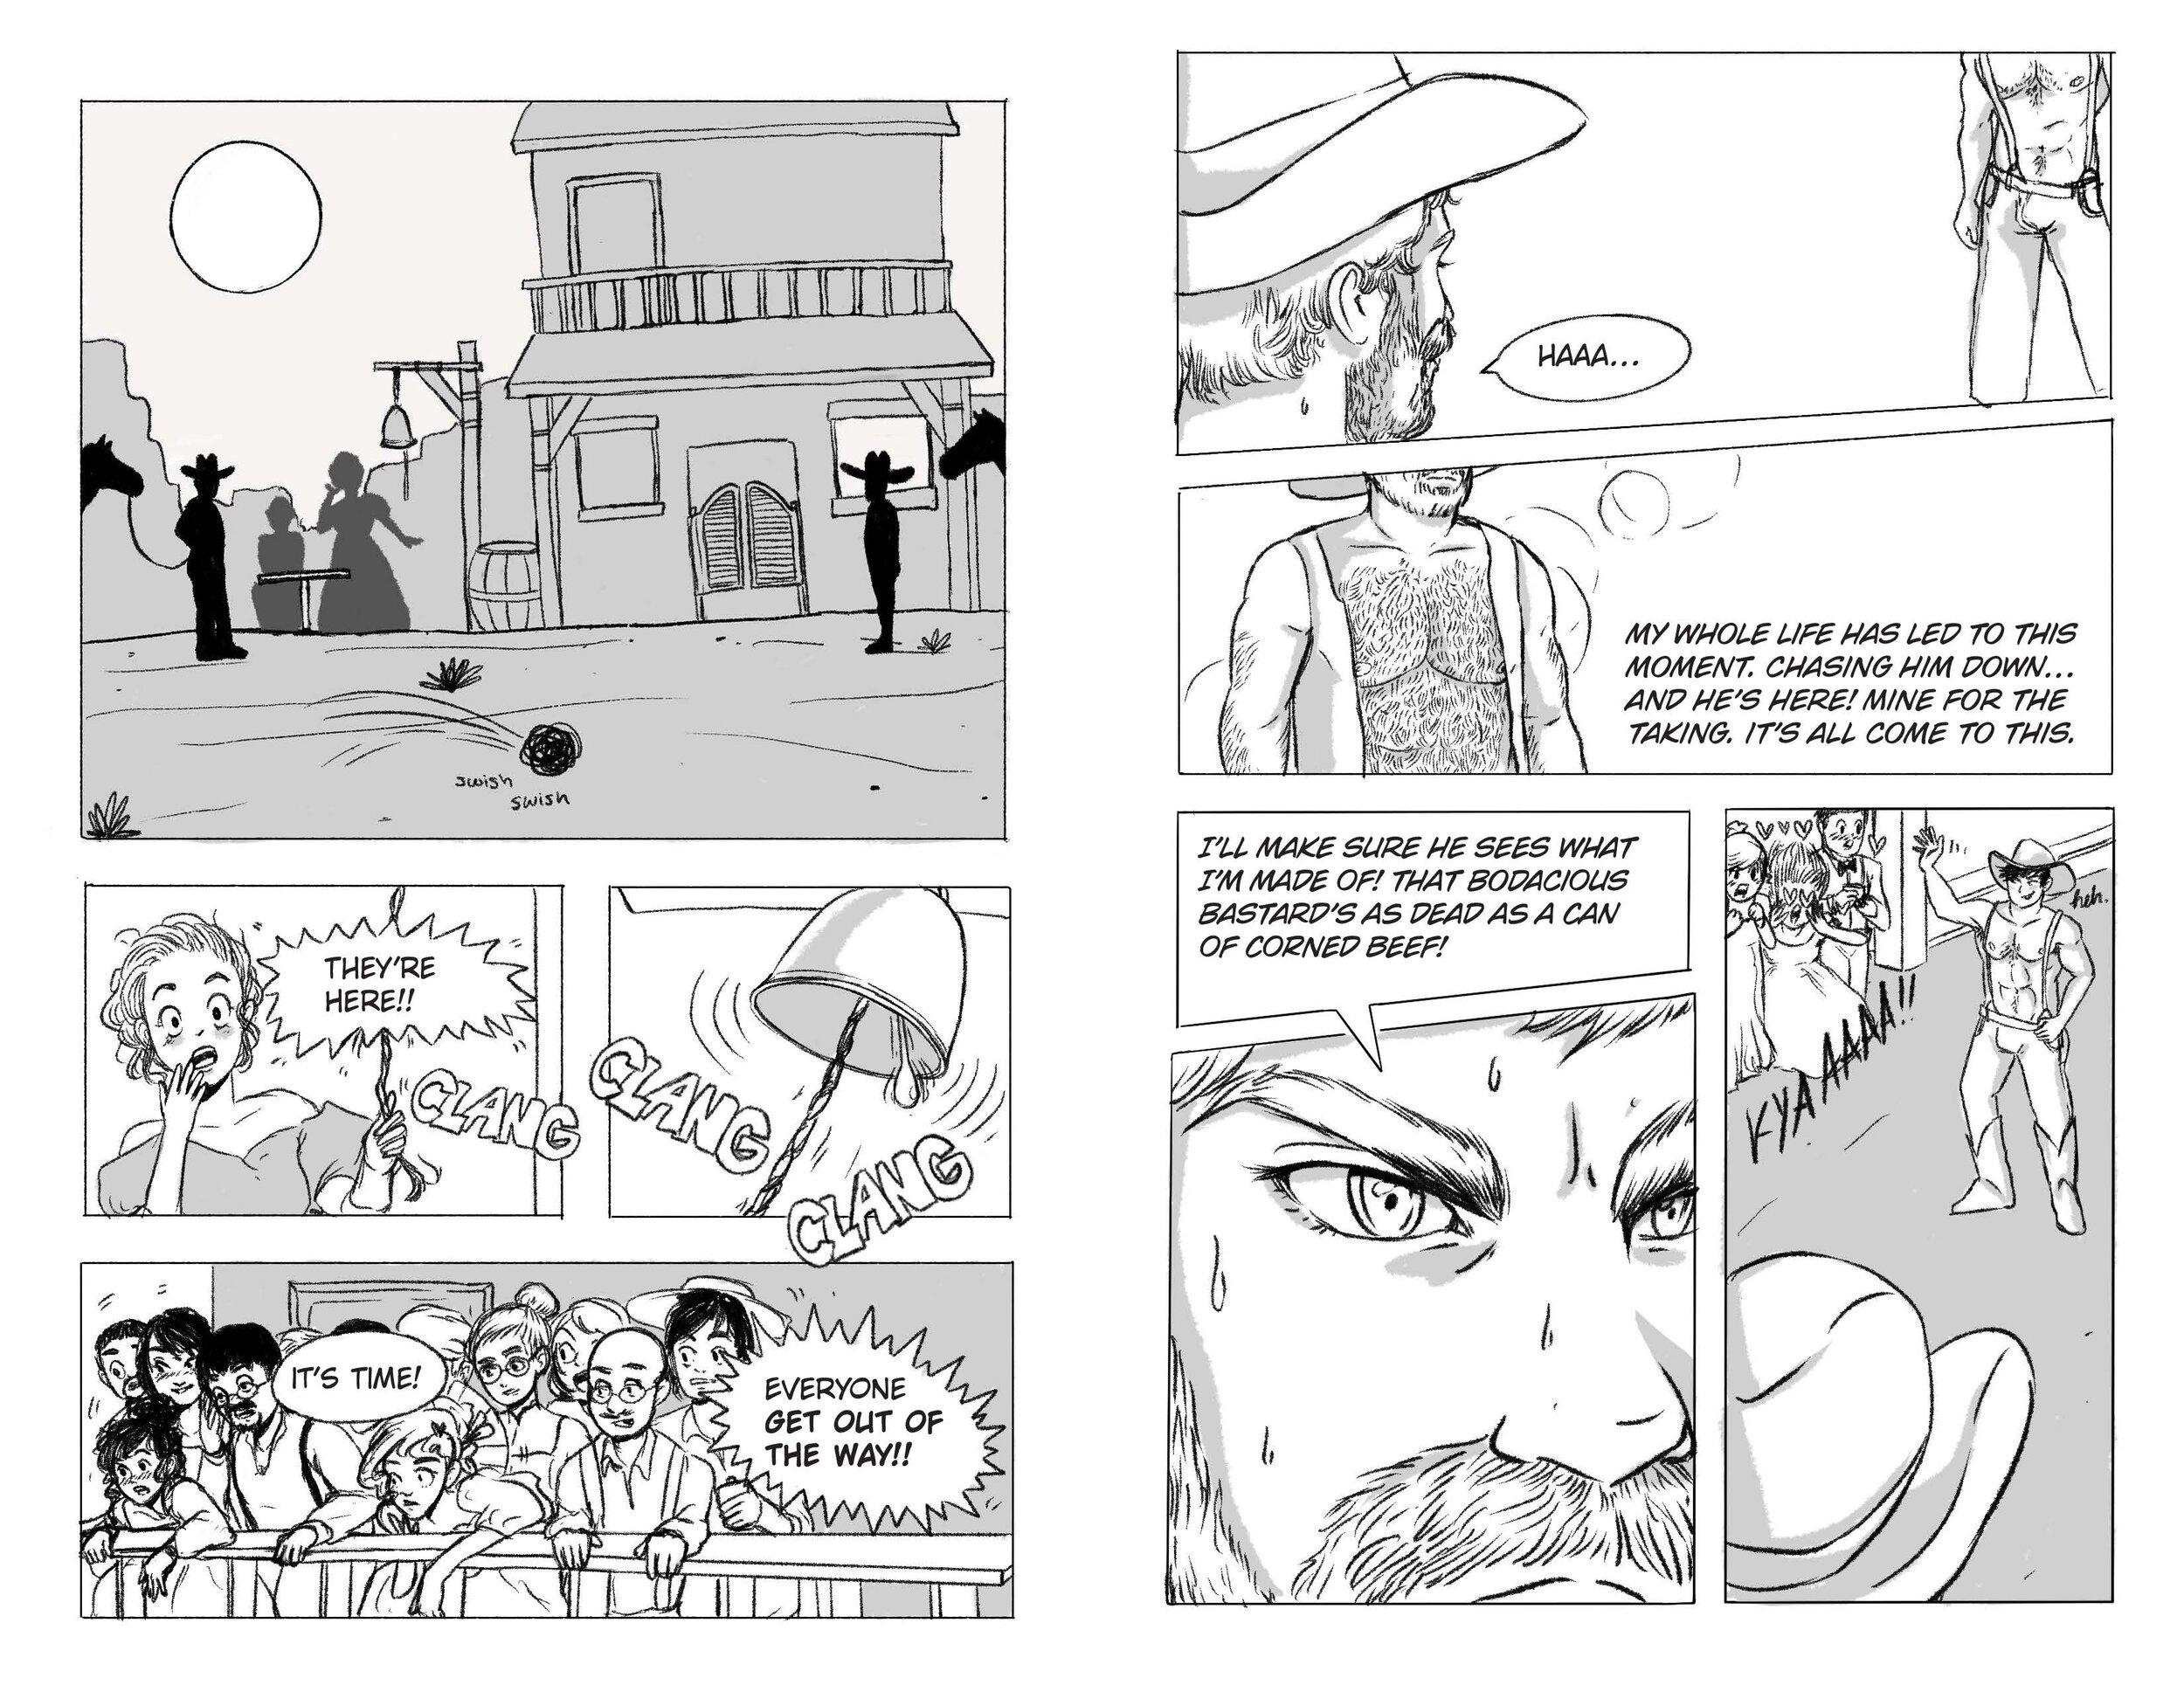 Cowboys_FULLDRAFT_v02_Page_3.jpg